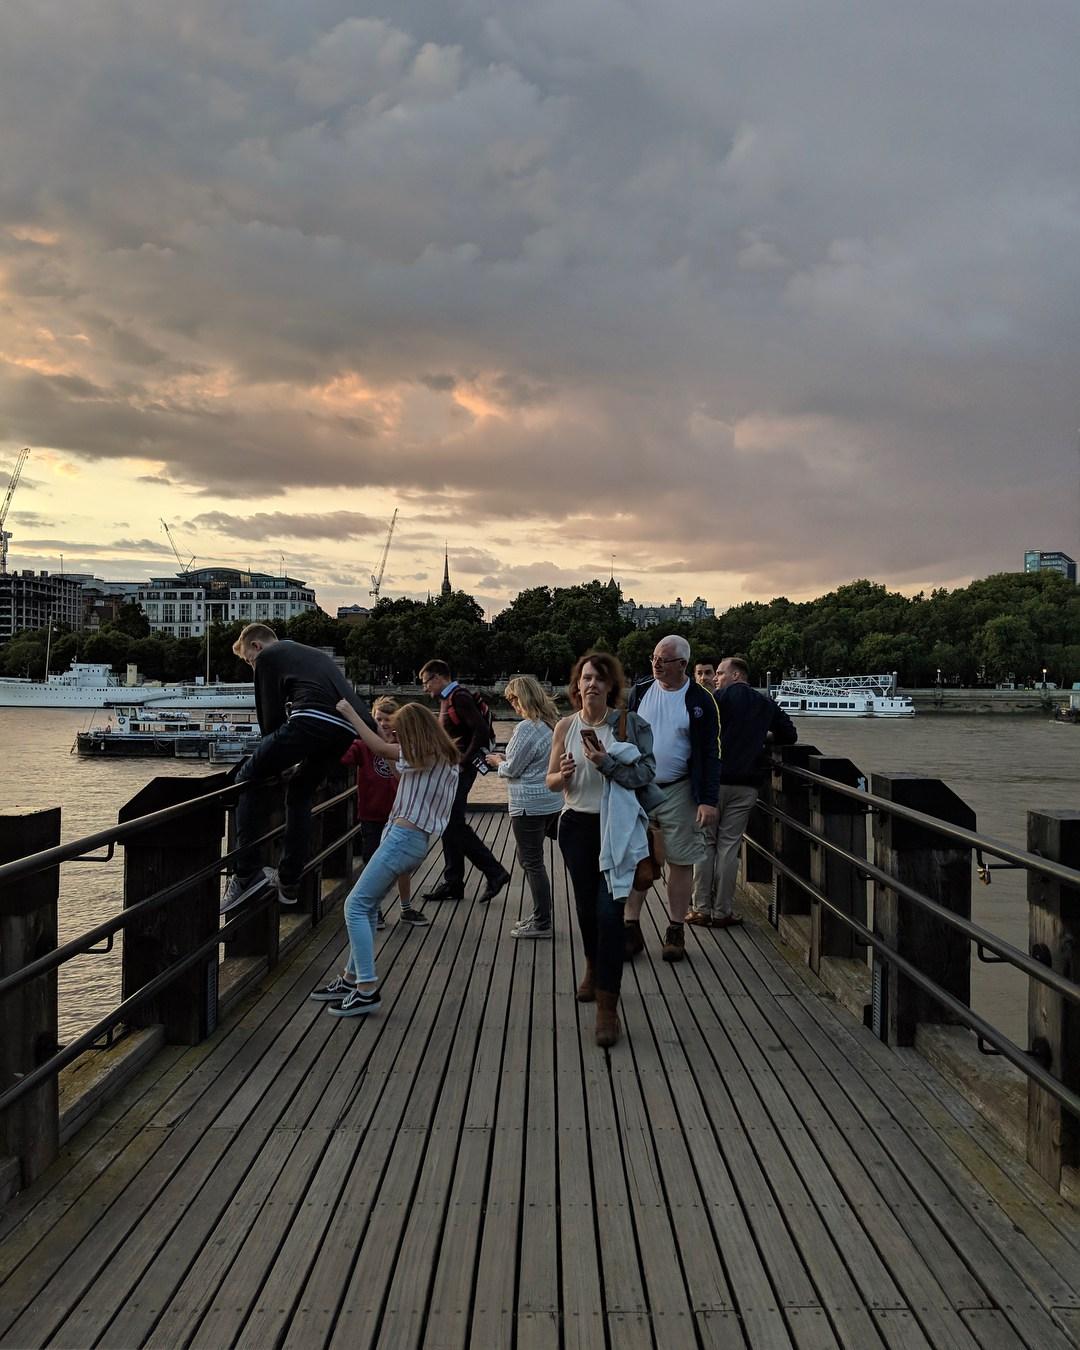 Google Pixel 3 XL camera samples London 7 - تسريب صور يزعم أنها ملتقطة بواسطة كاميرا بكسل 3 XL المرتقب إطلاقه أكتوبر القادم